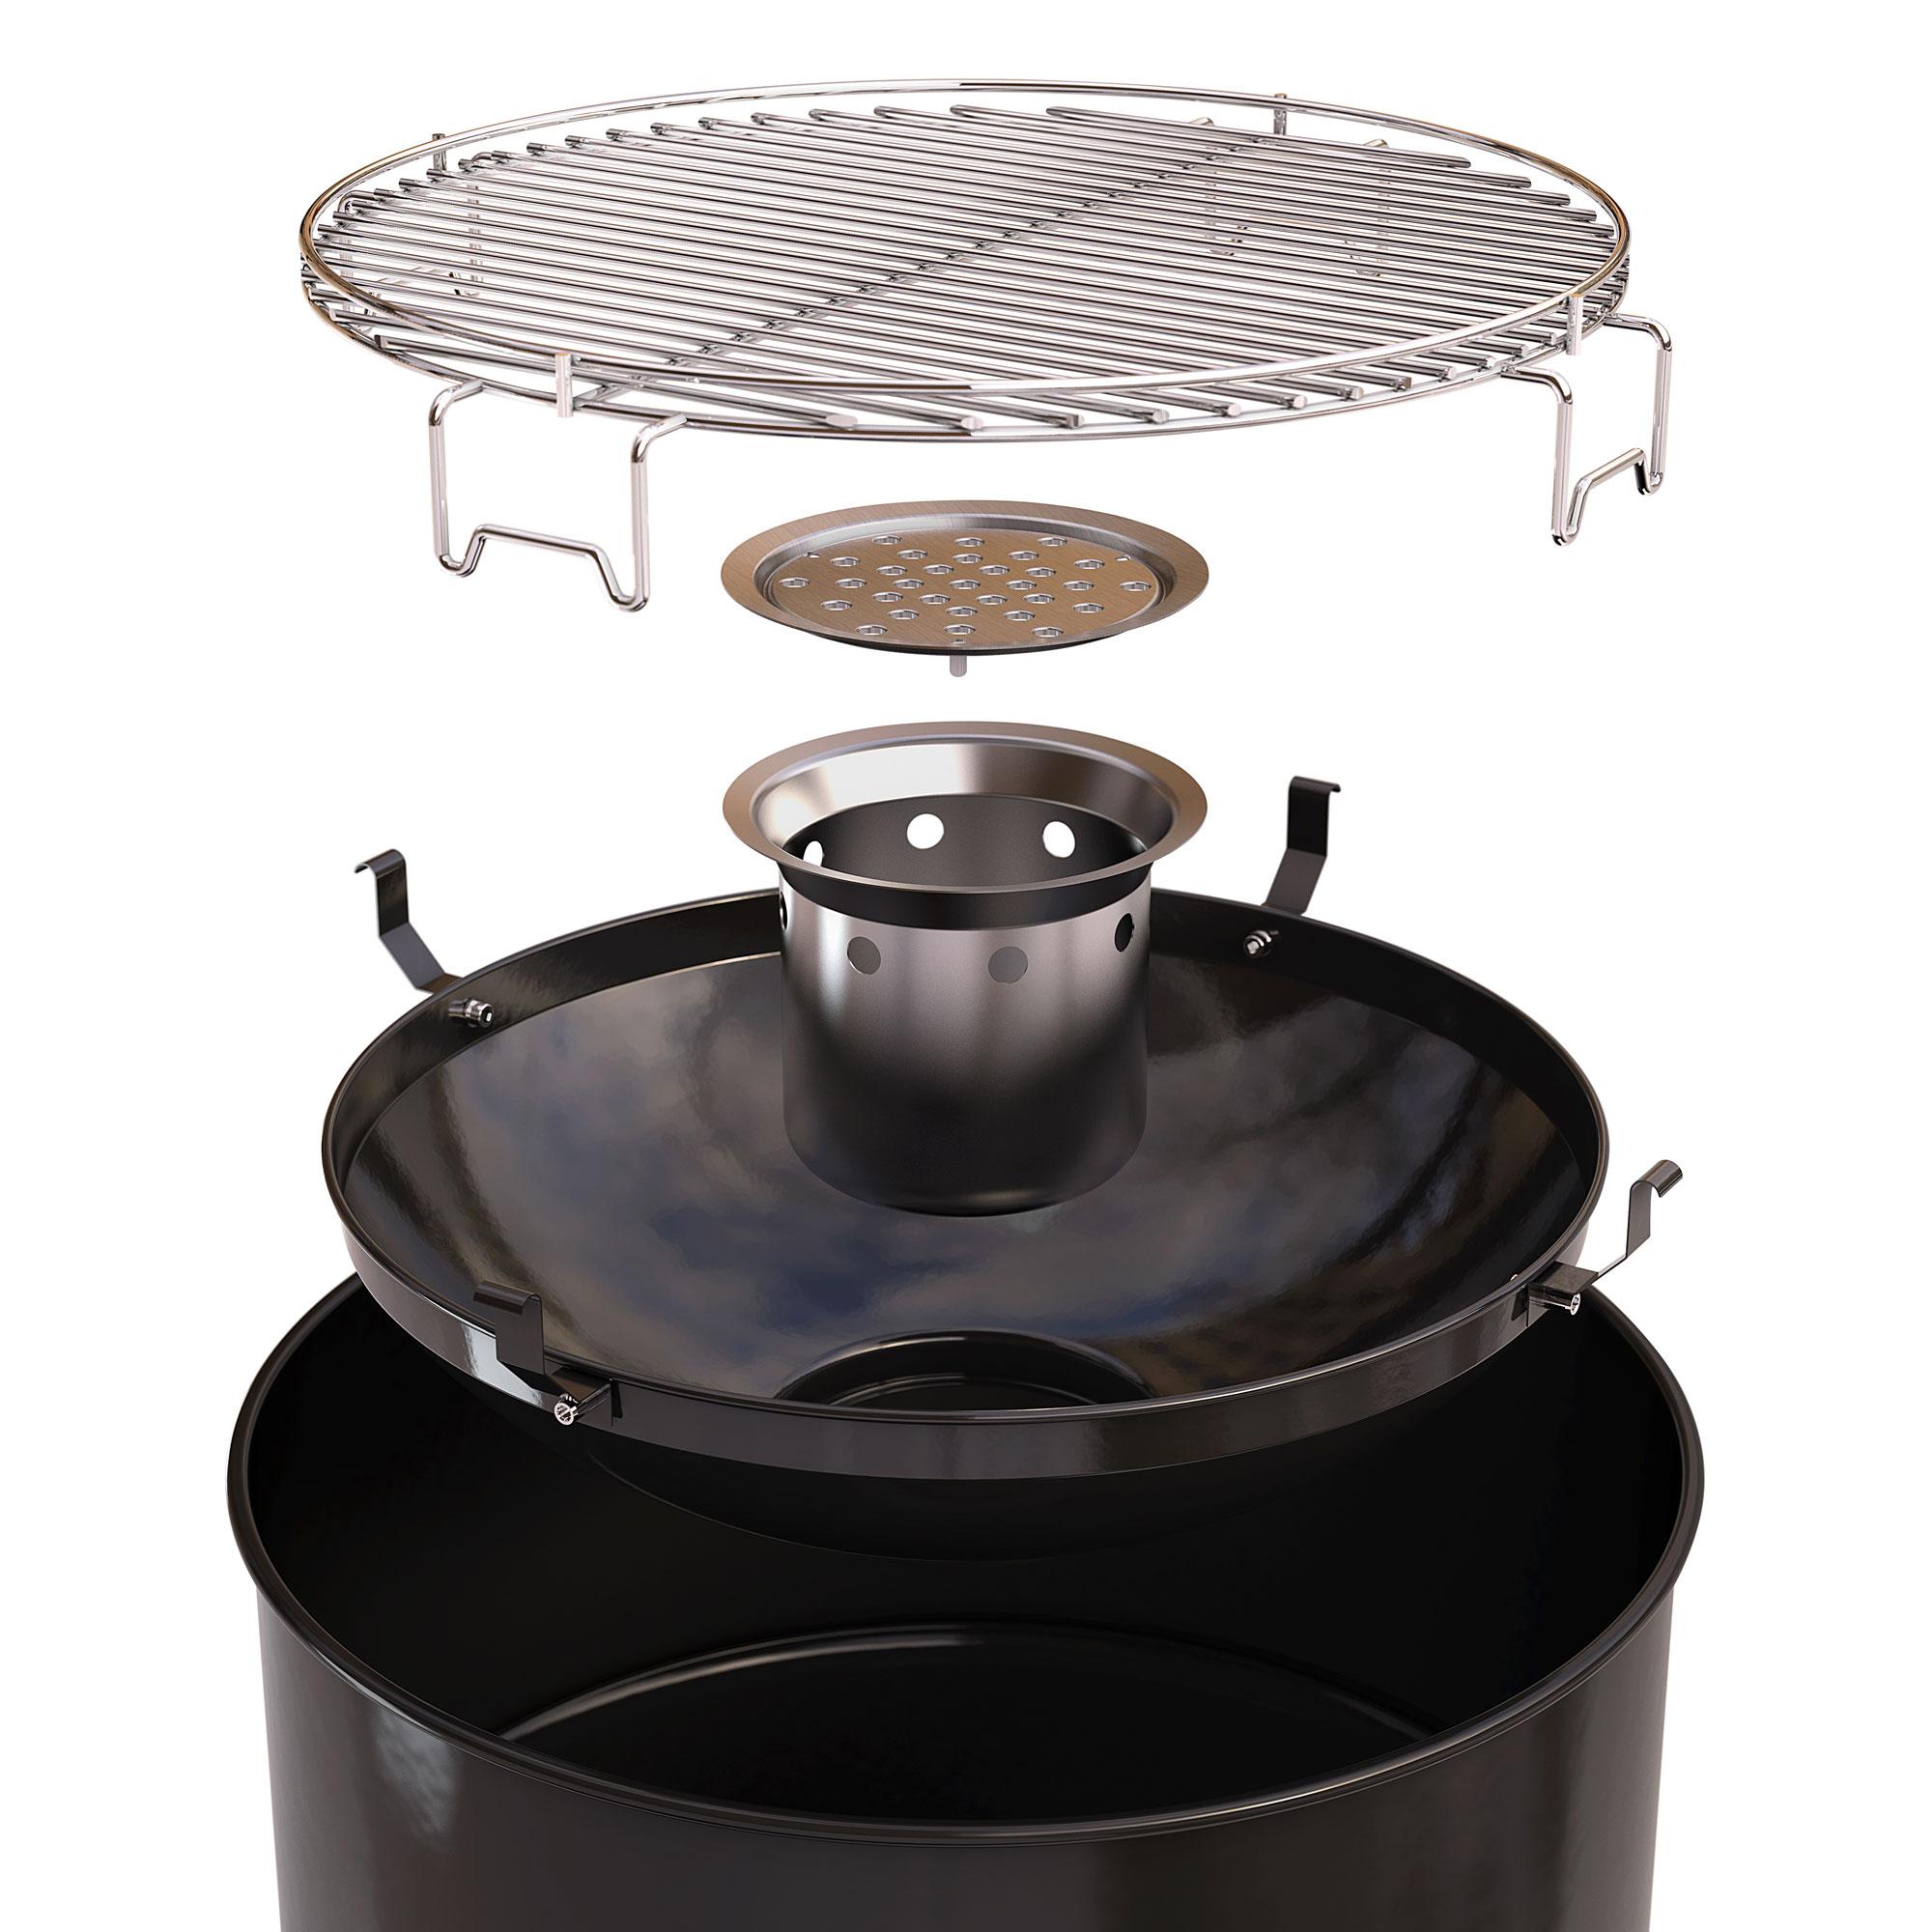 Grilltonne / Ghettotonne barbecook Edson Black Grillfläche Ø47,5cm Bild 2